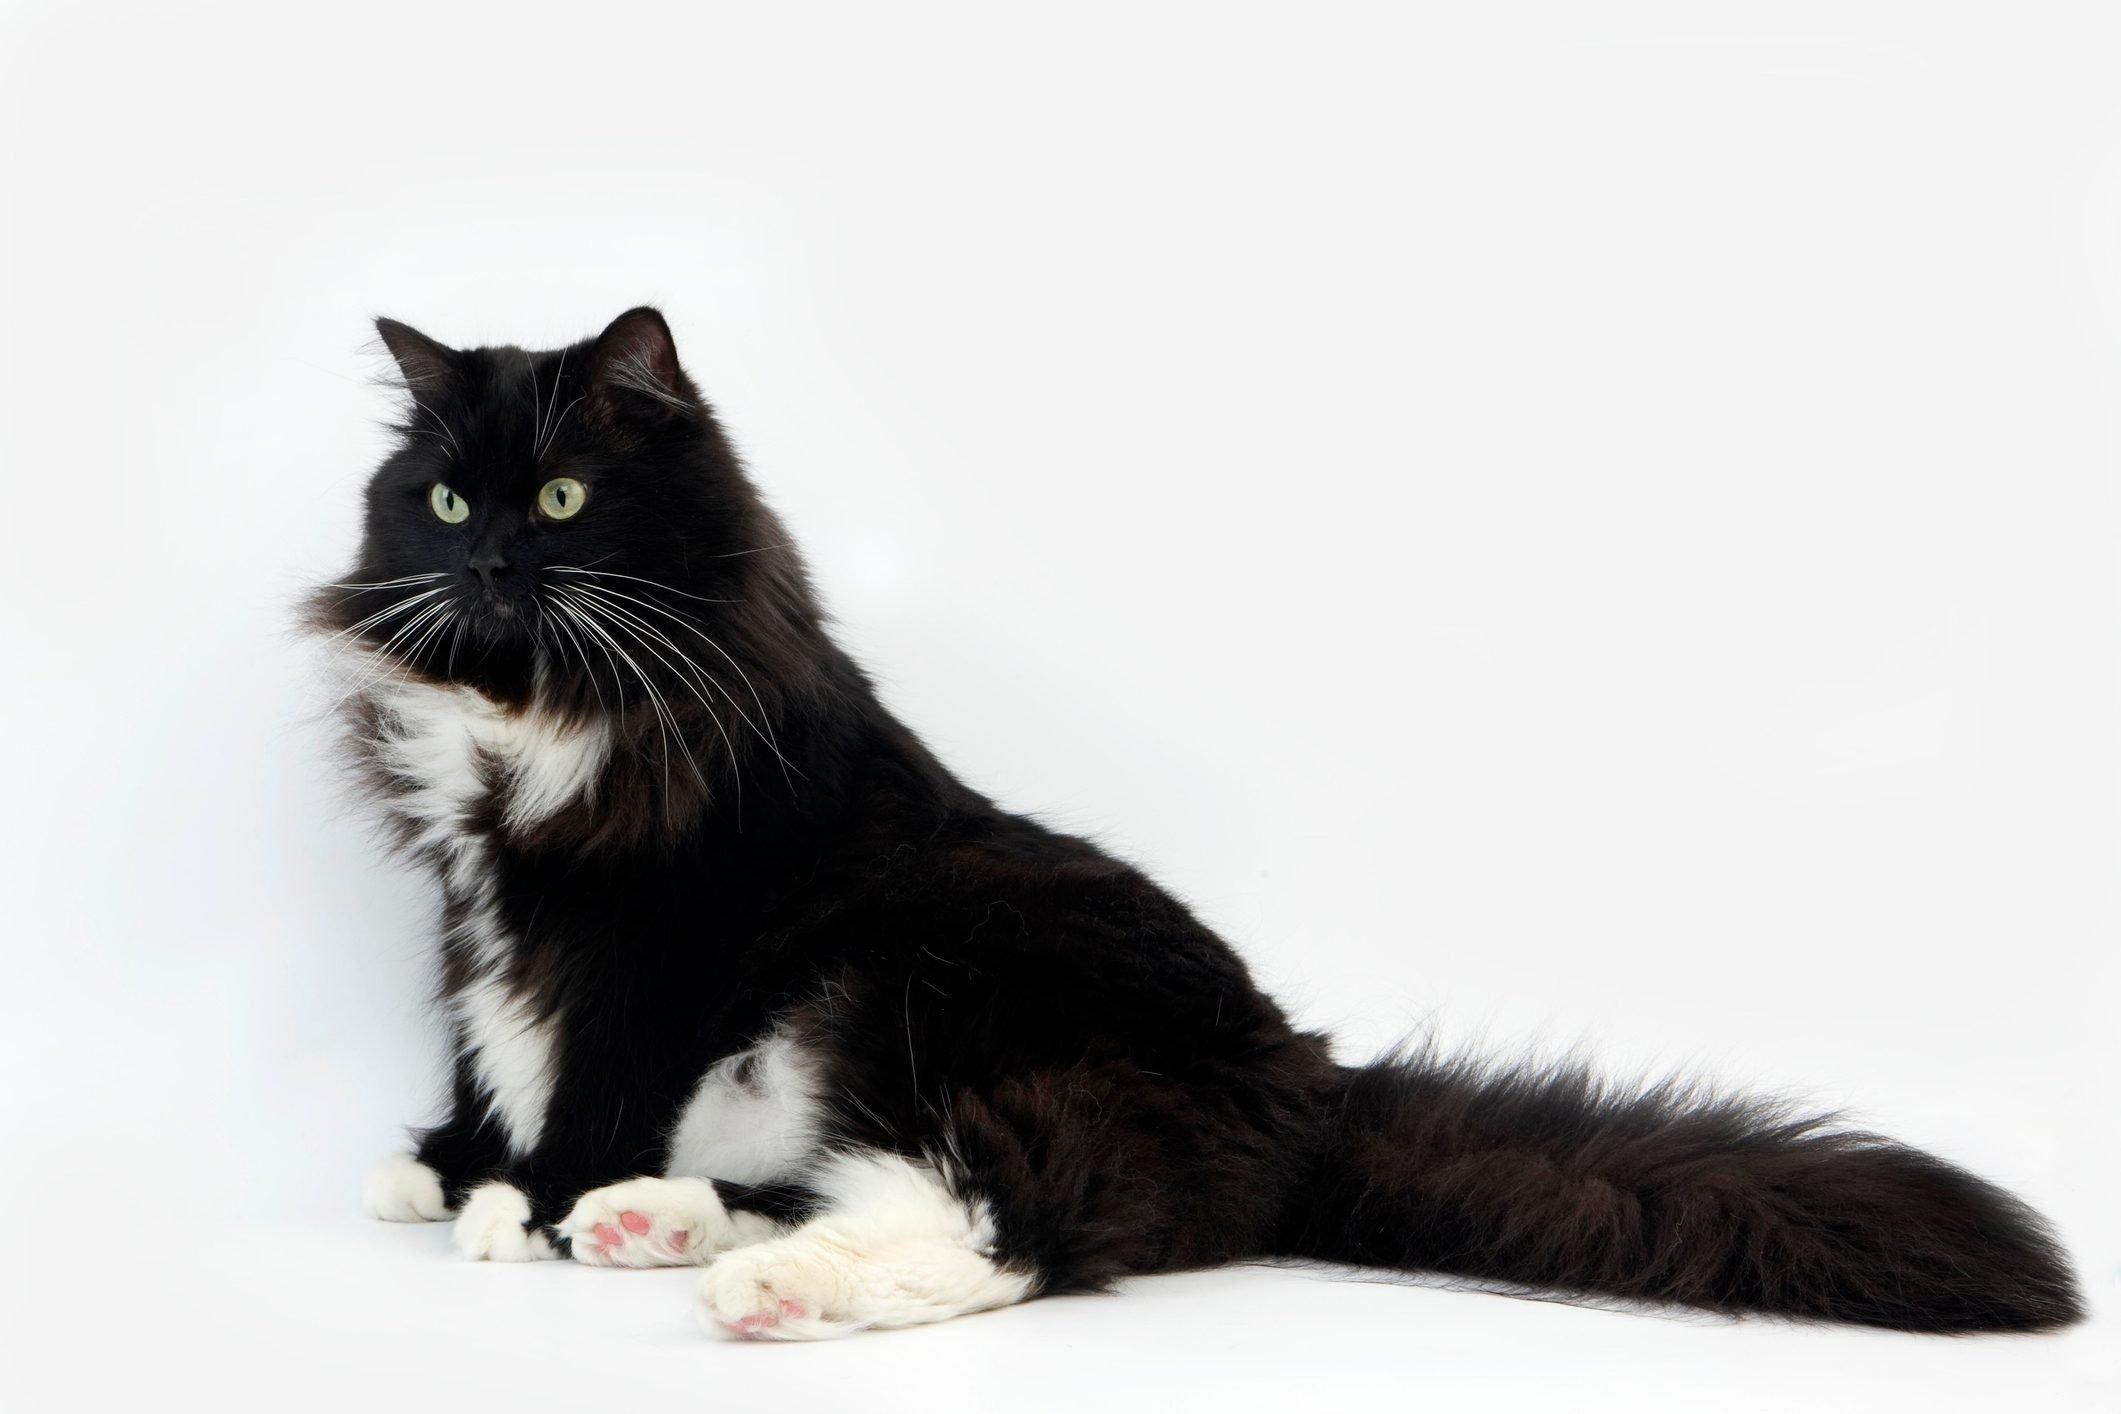 Black and White Siberian Domestic Cat, Female against White Background